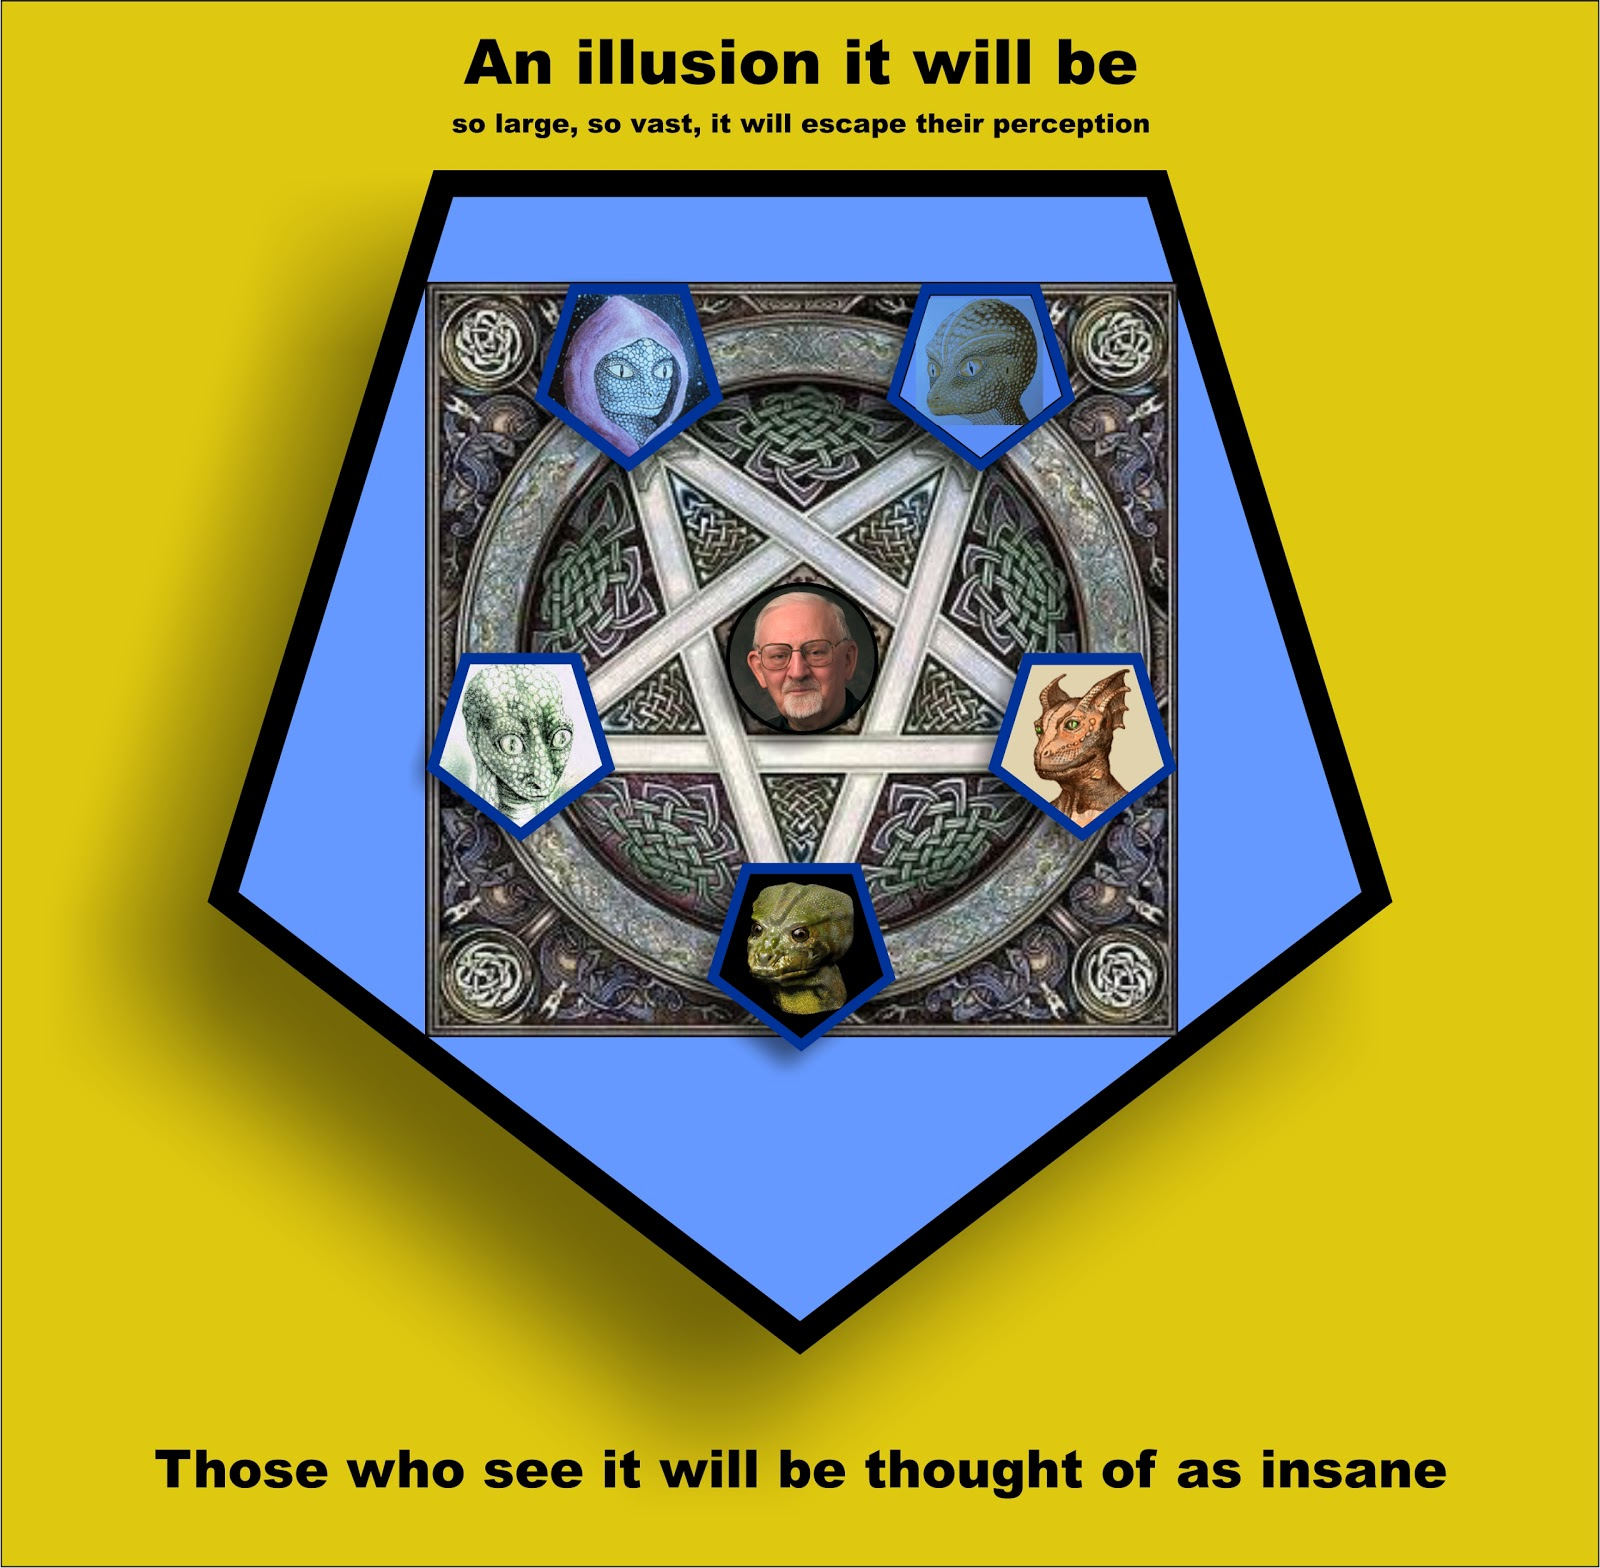 http://4.bp.blogspot.com/-s9mH-cobiYc/UG_CBl1J9SI/AAAAAAAAEEk/Z5GEApNegP0/s1600/Illuminati+bloodlines.+The+Satanic+Circle.+The+ancient+fellowship+of+evil.+%231ab.+(1).jpg?SSImageQuality=Full